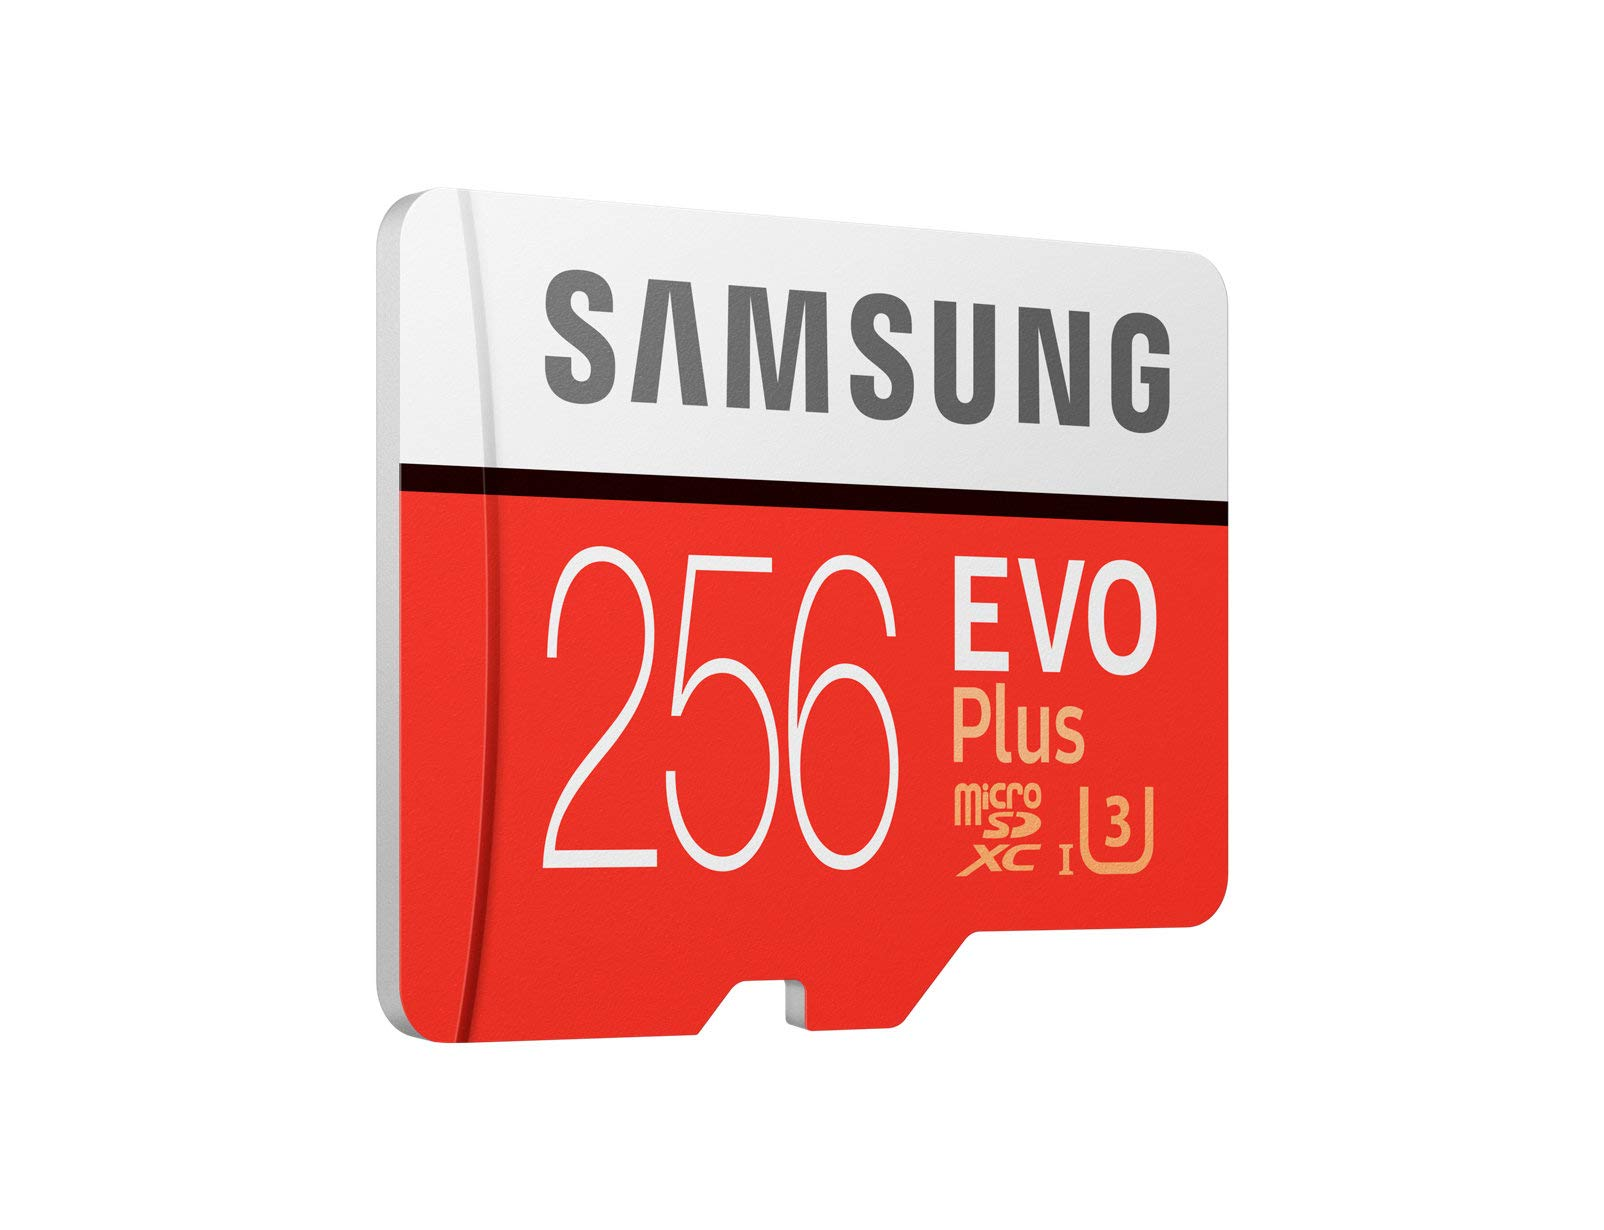 Samsung 256GB EVO Plus Class 10 UHS-I microSDXC U3 with Adapter (MB-MC256GA) by Samsung (Image #2)